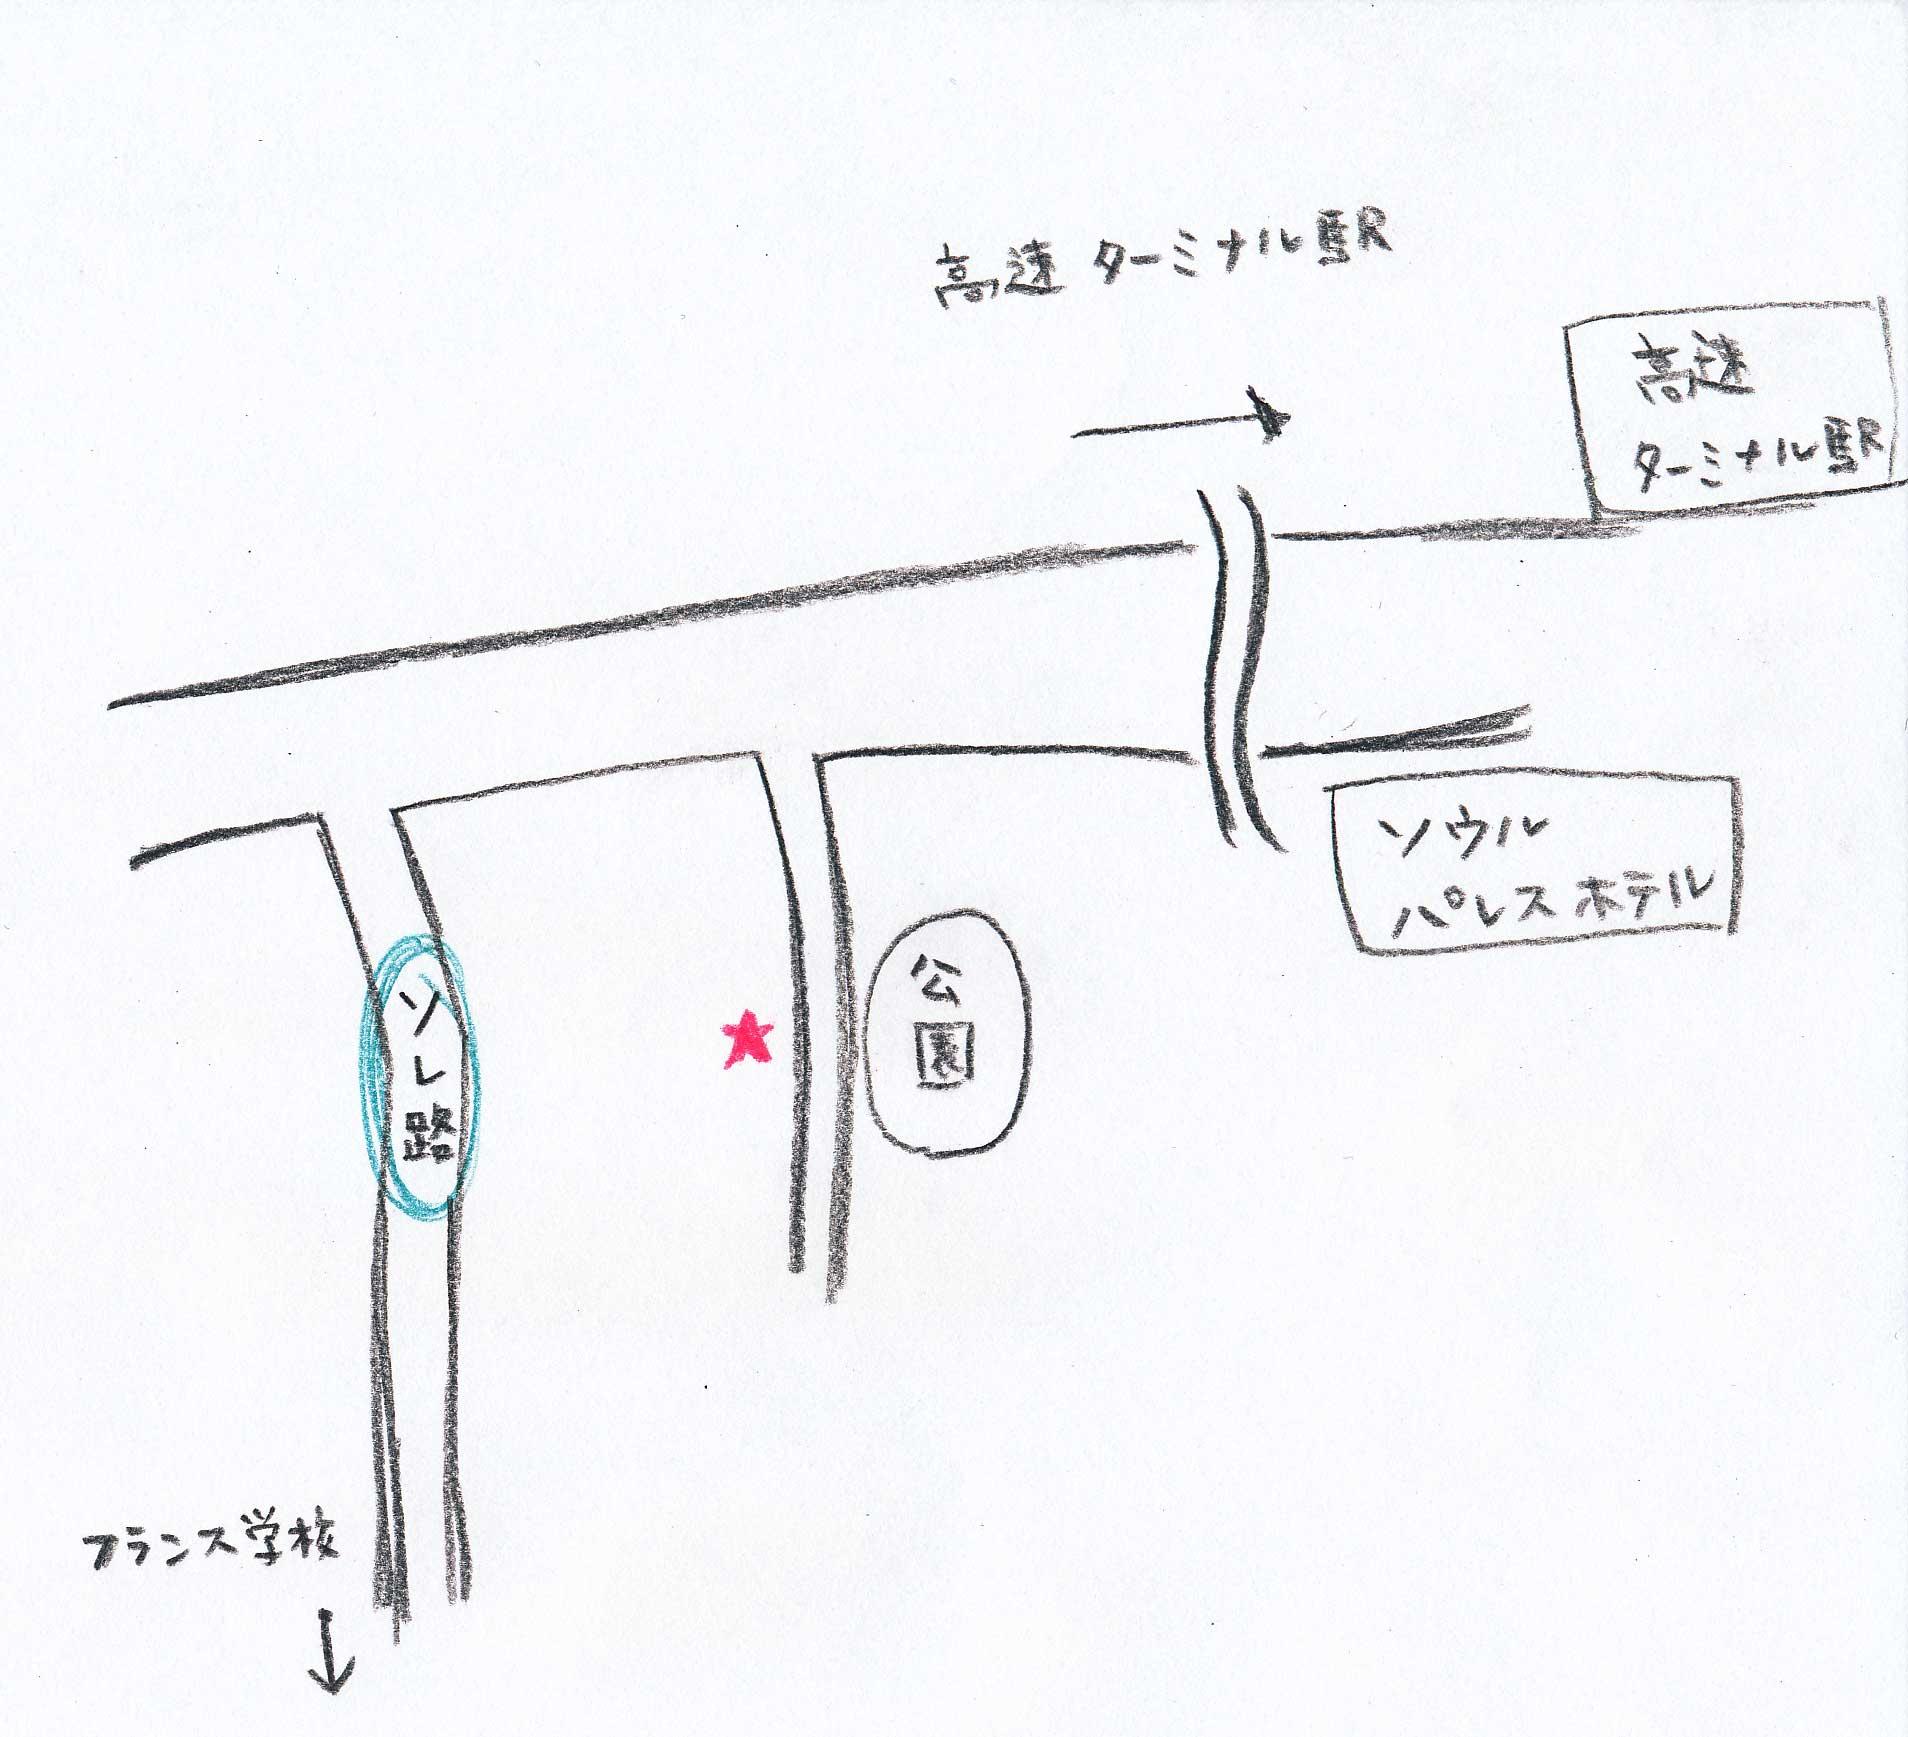 hotel-douce-map.jpg